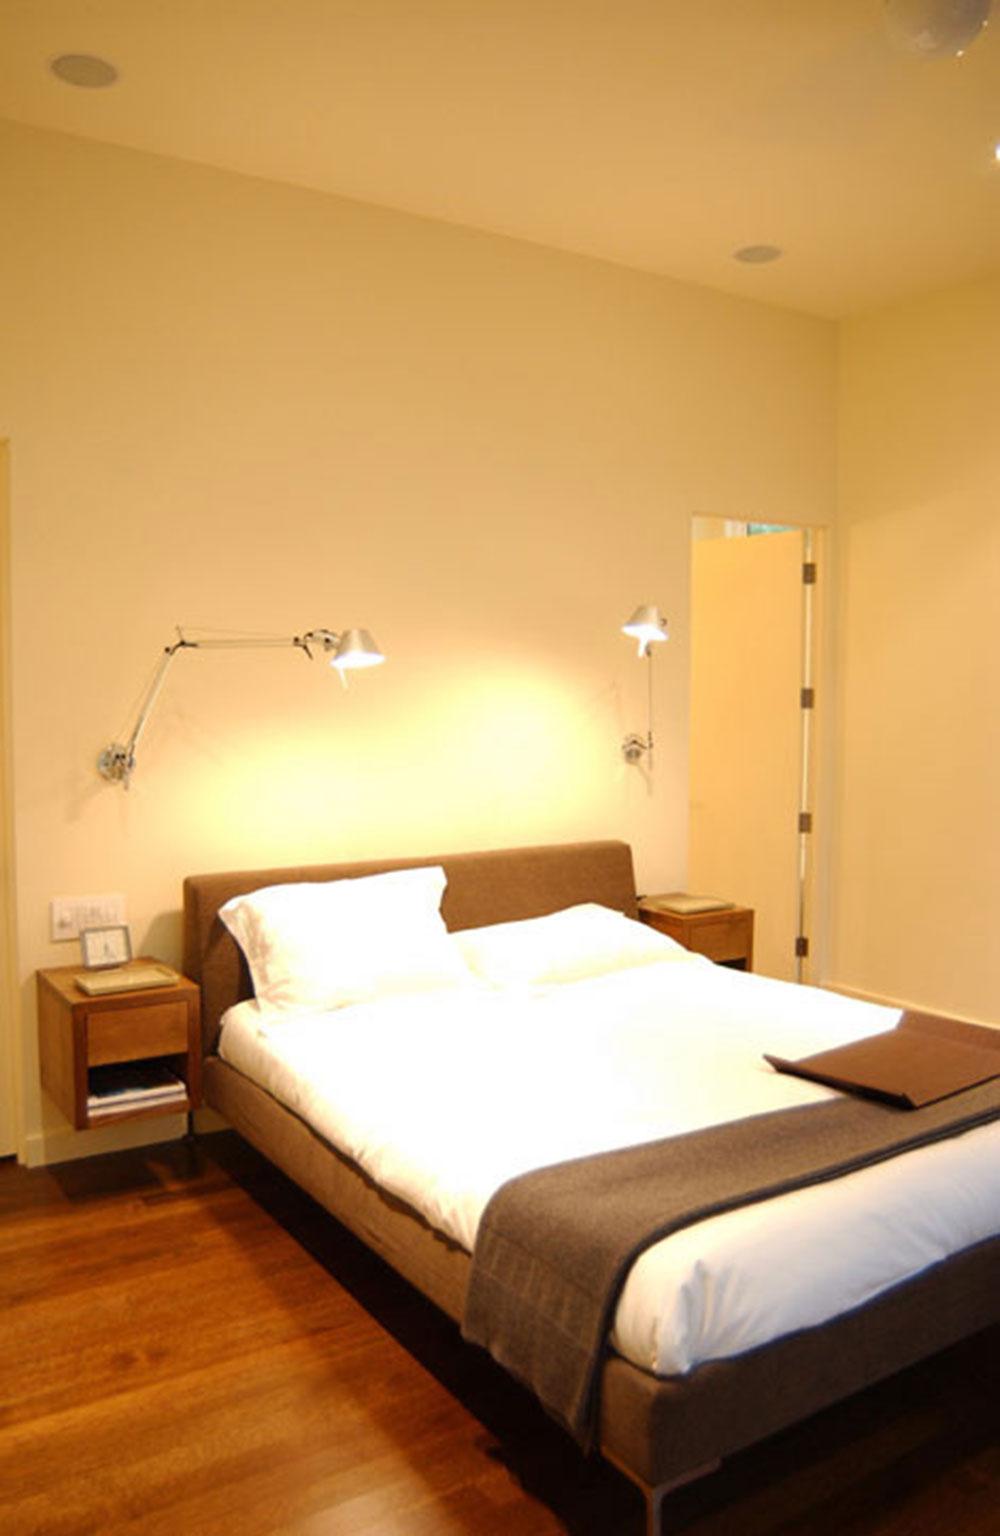 Wall-mounted nightstand-helpful-and-wonderful14 Wall-mounted nightstand - helpful and wonderful